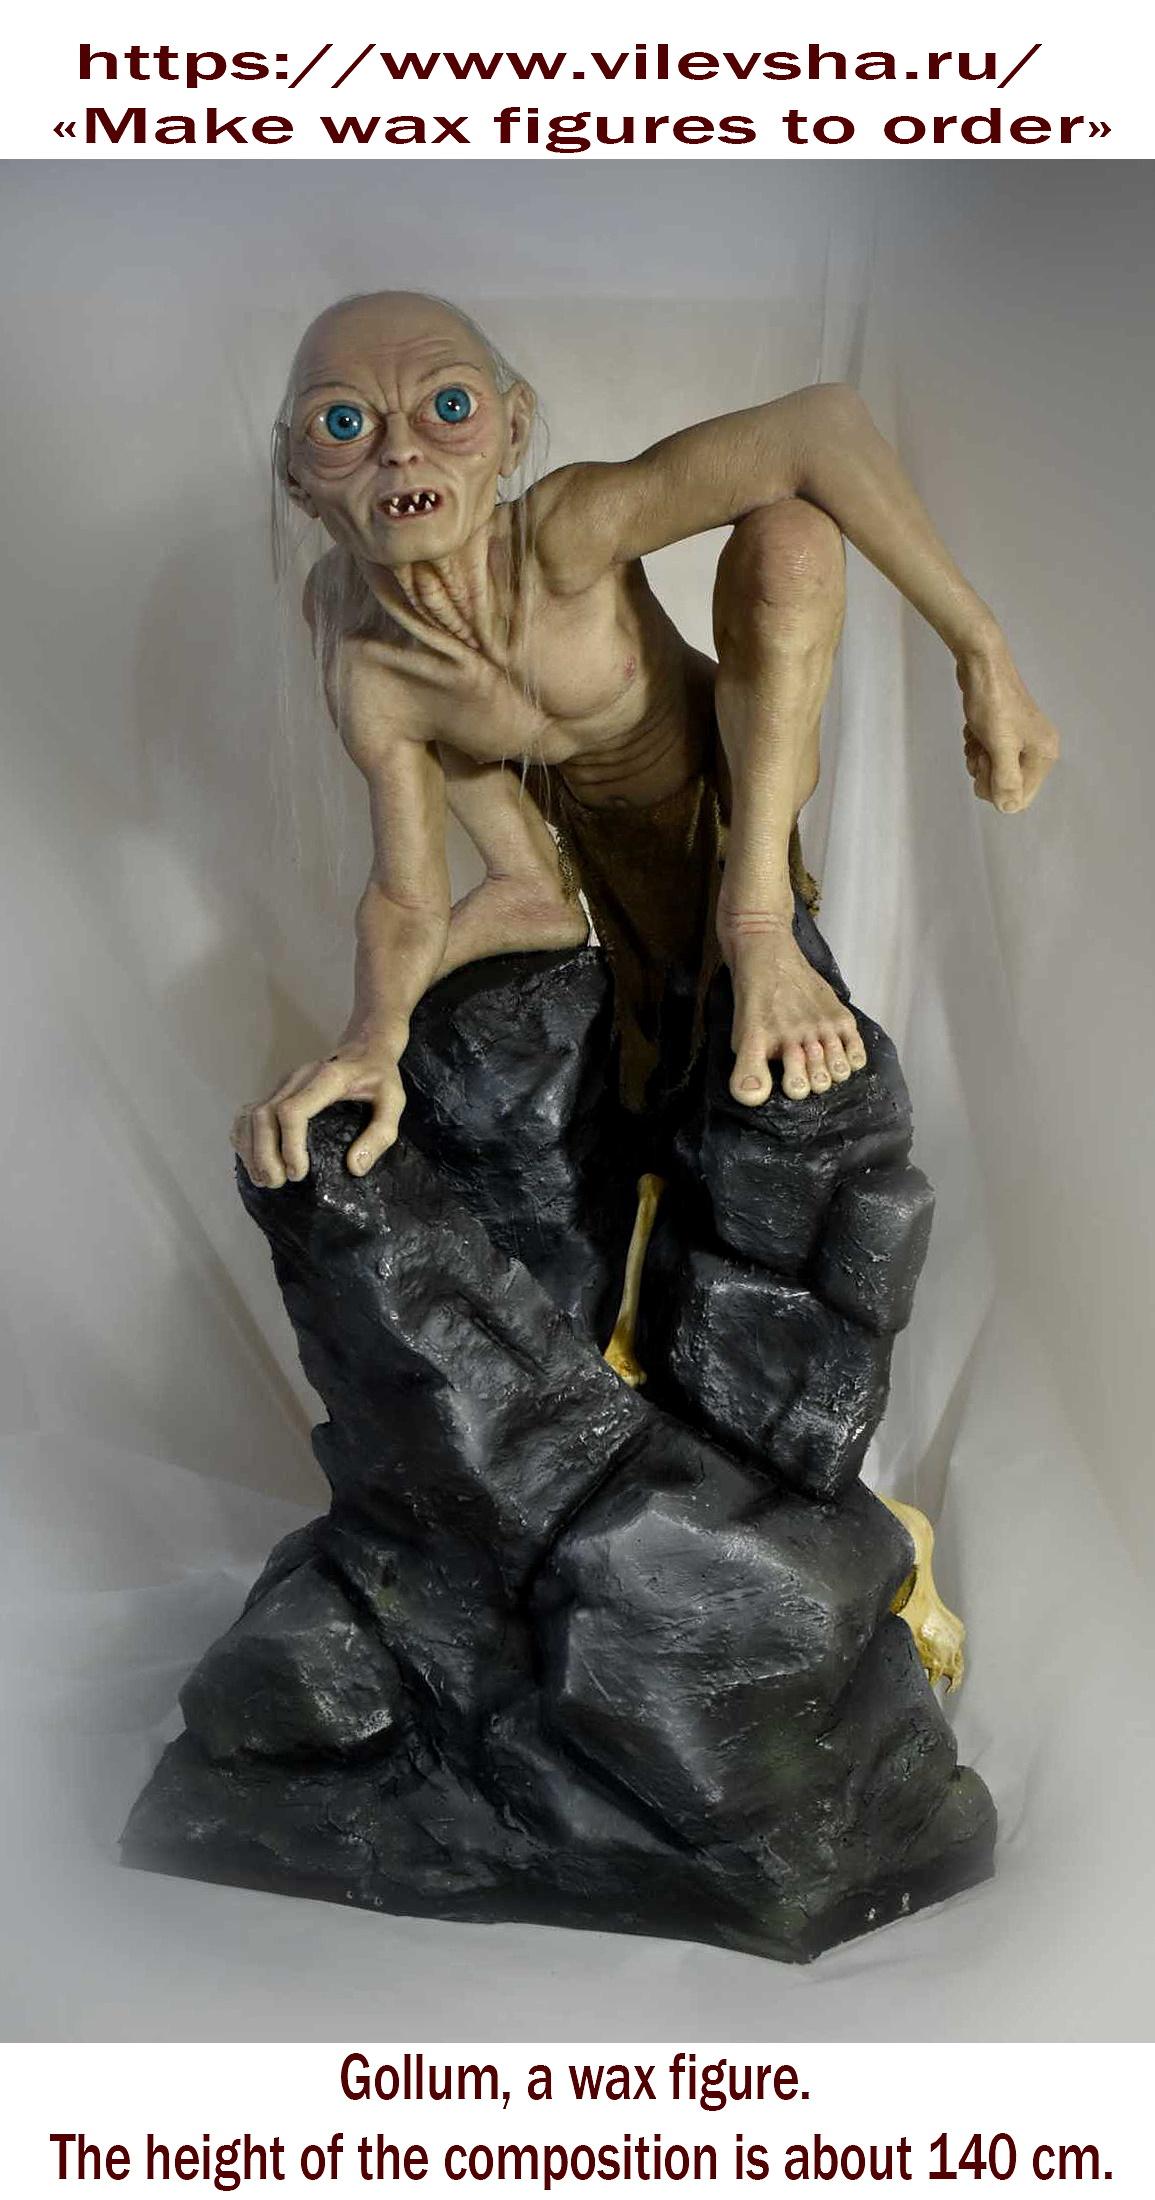 gollum-the-wax-figure